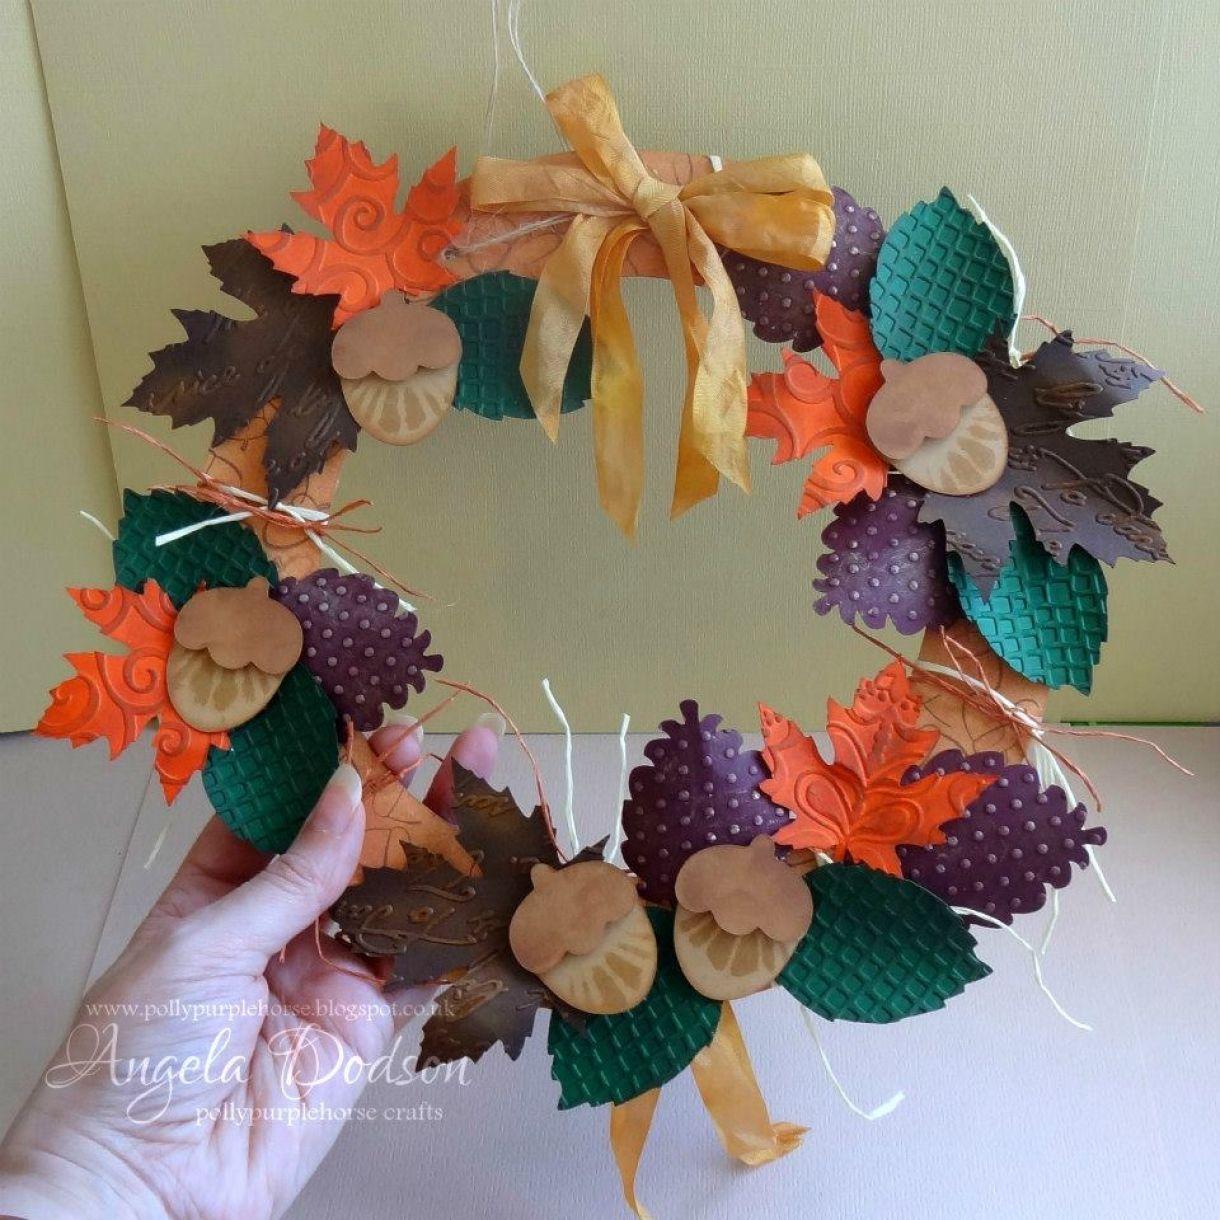 Autumn Paper Crafts Leaf Wreath 1